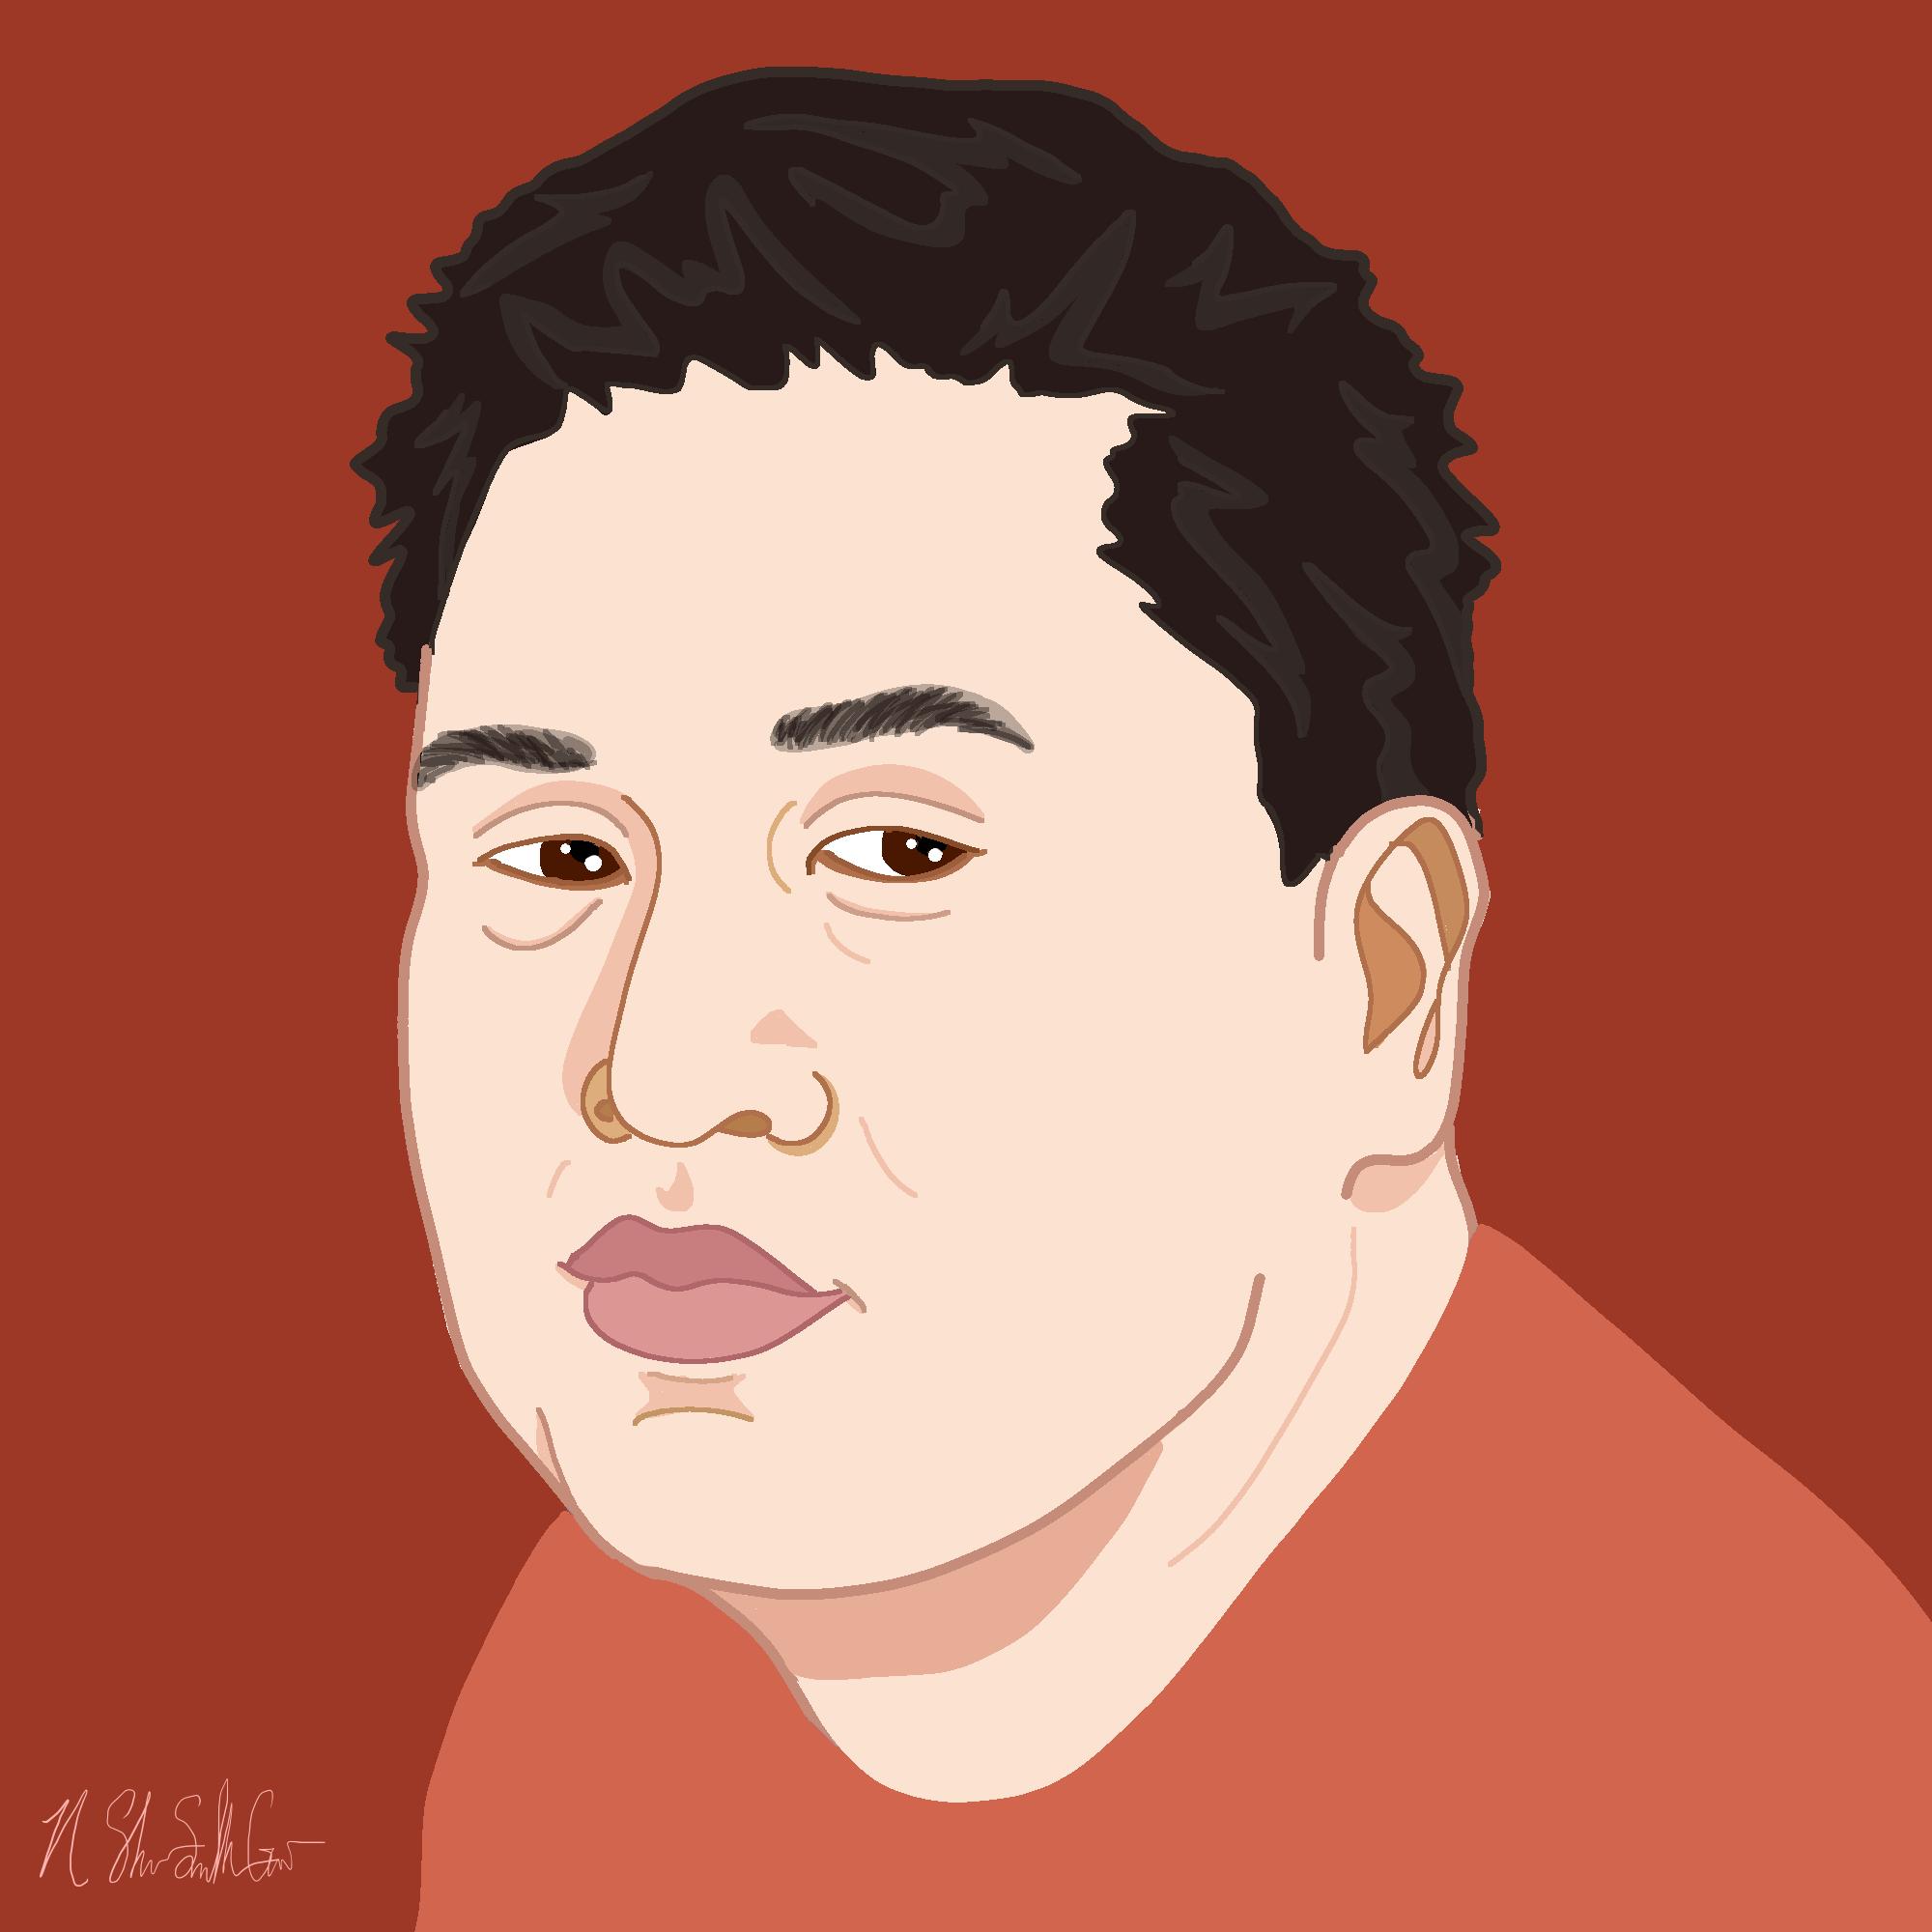 Ryan Su